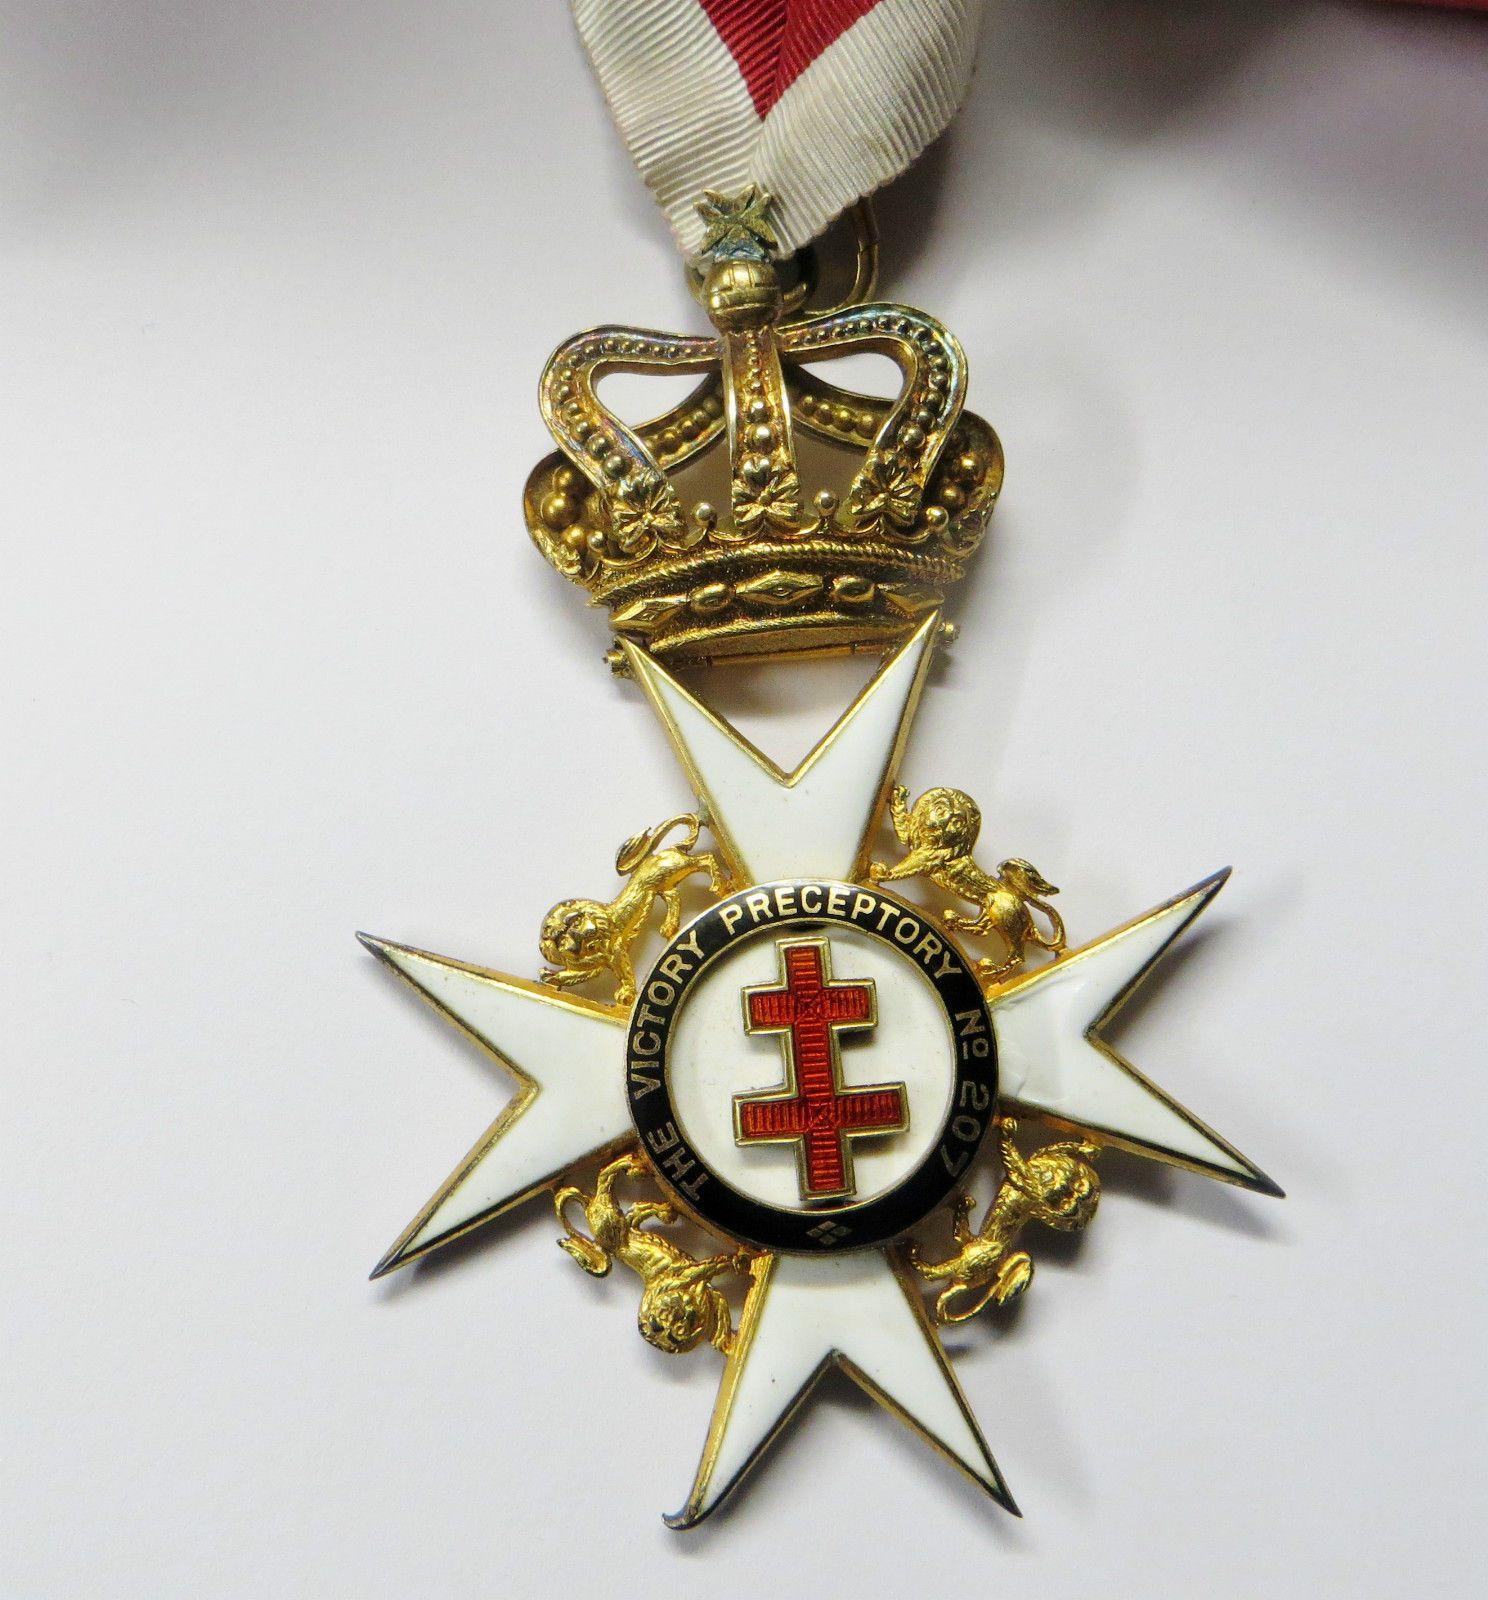 Ww2 Silver Masonic Jewel Knight Templar Preceptor Jewel